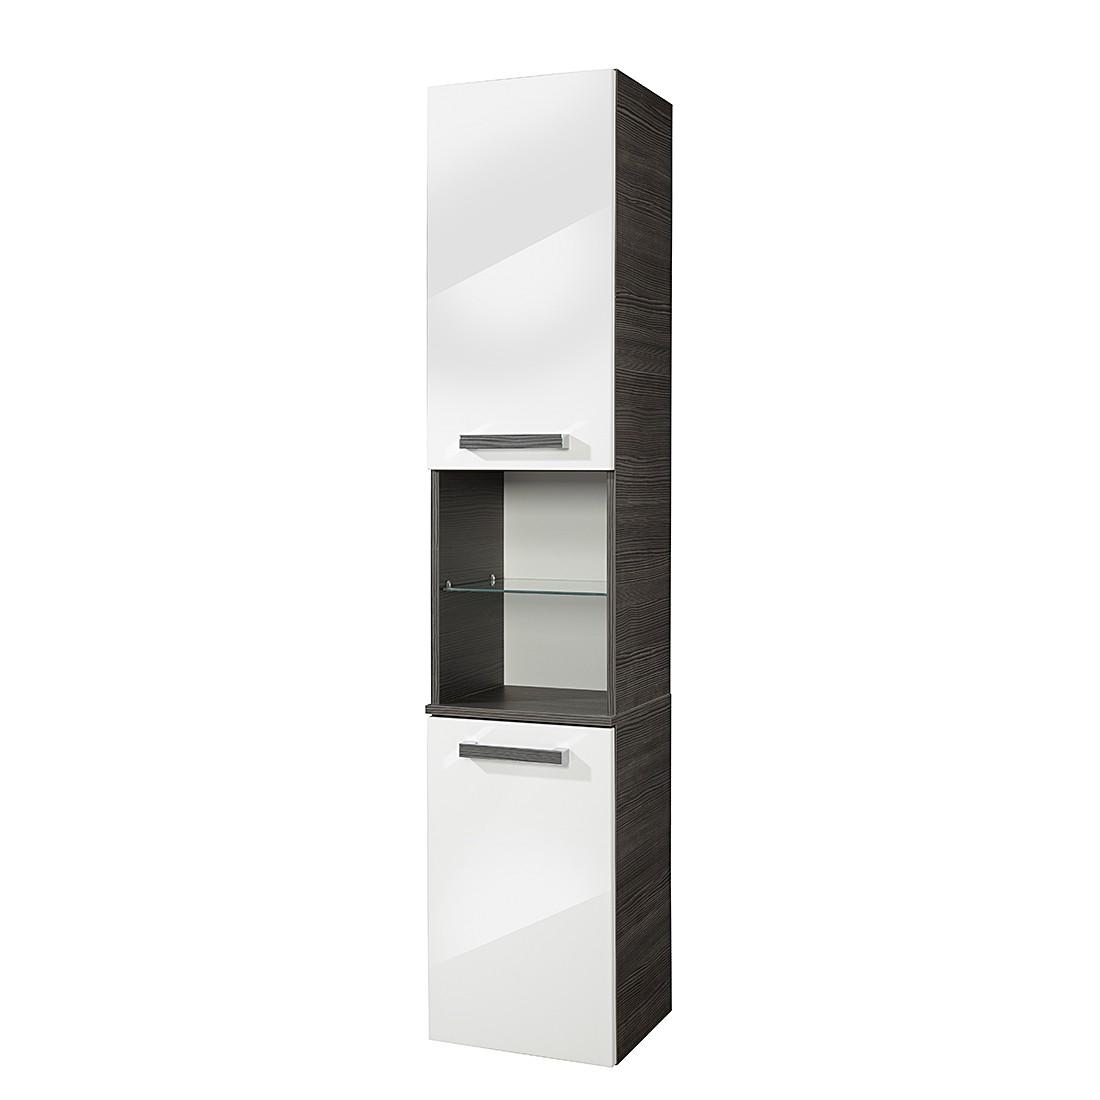 wei anschlag rechts ma e breite 35 cm tiefe 169 cm tiefe 32 cm. Black Bedroom Furniture Sets. Home Design Ideas